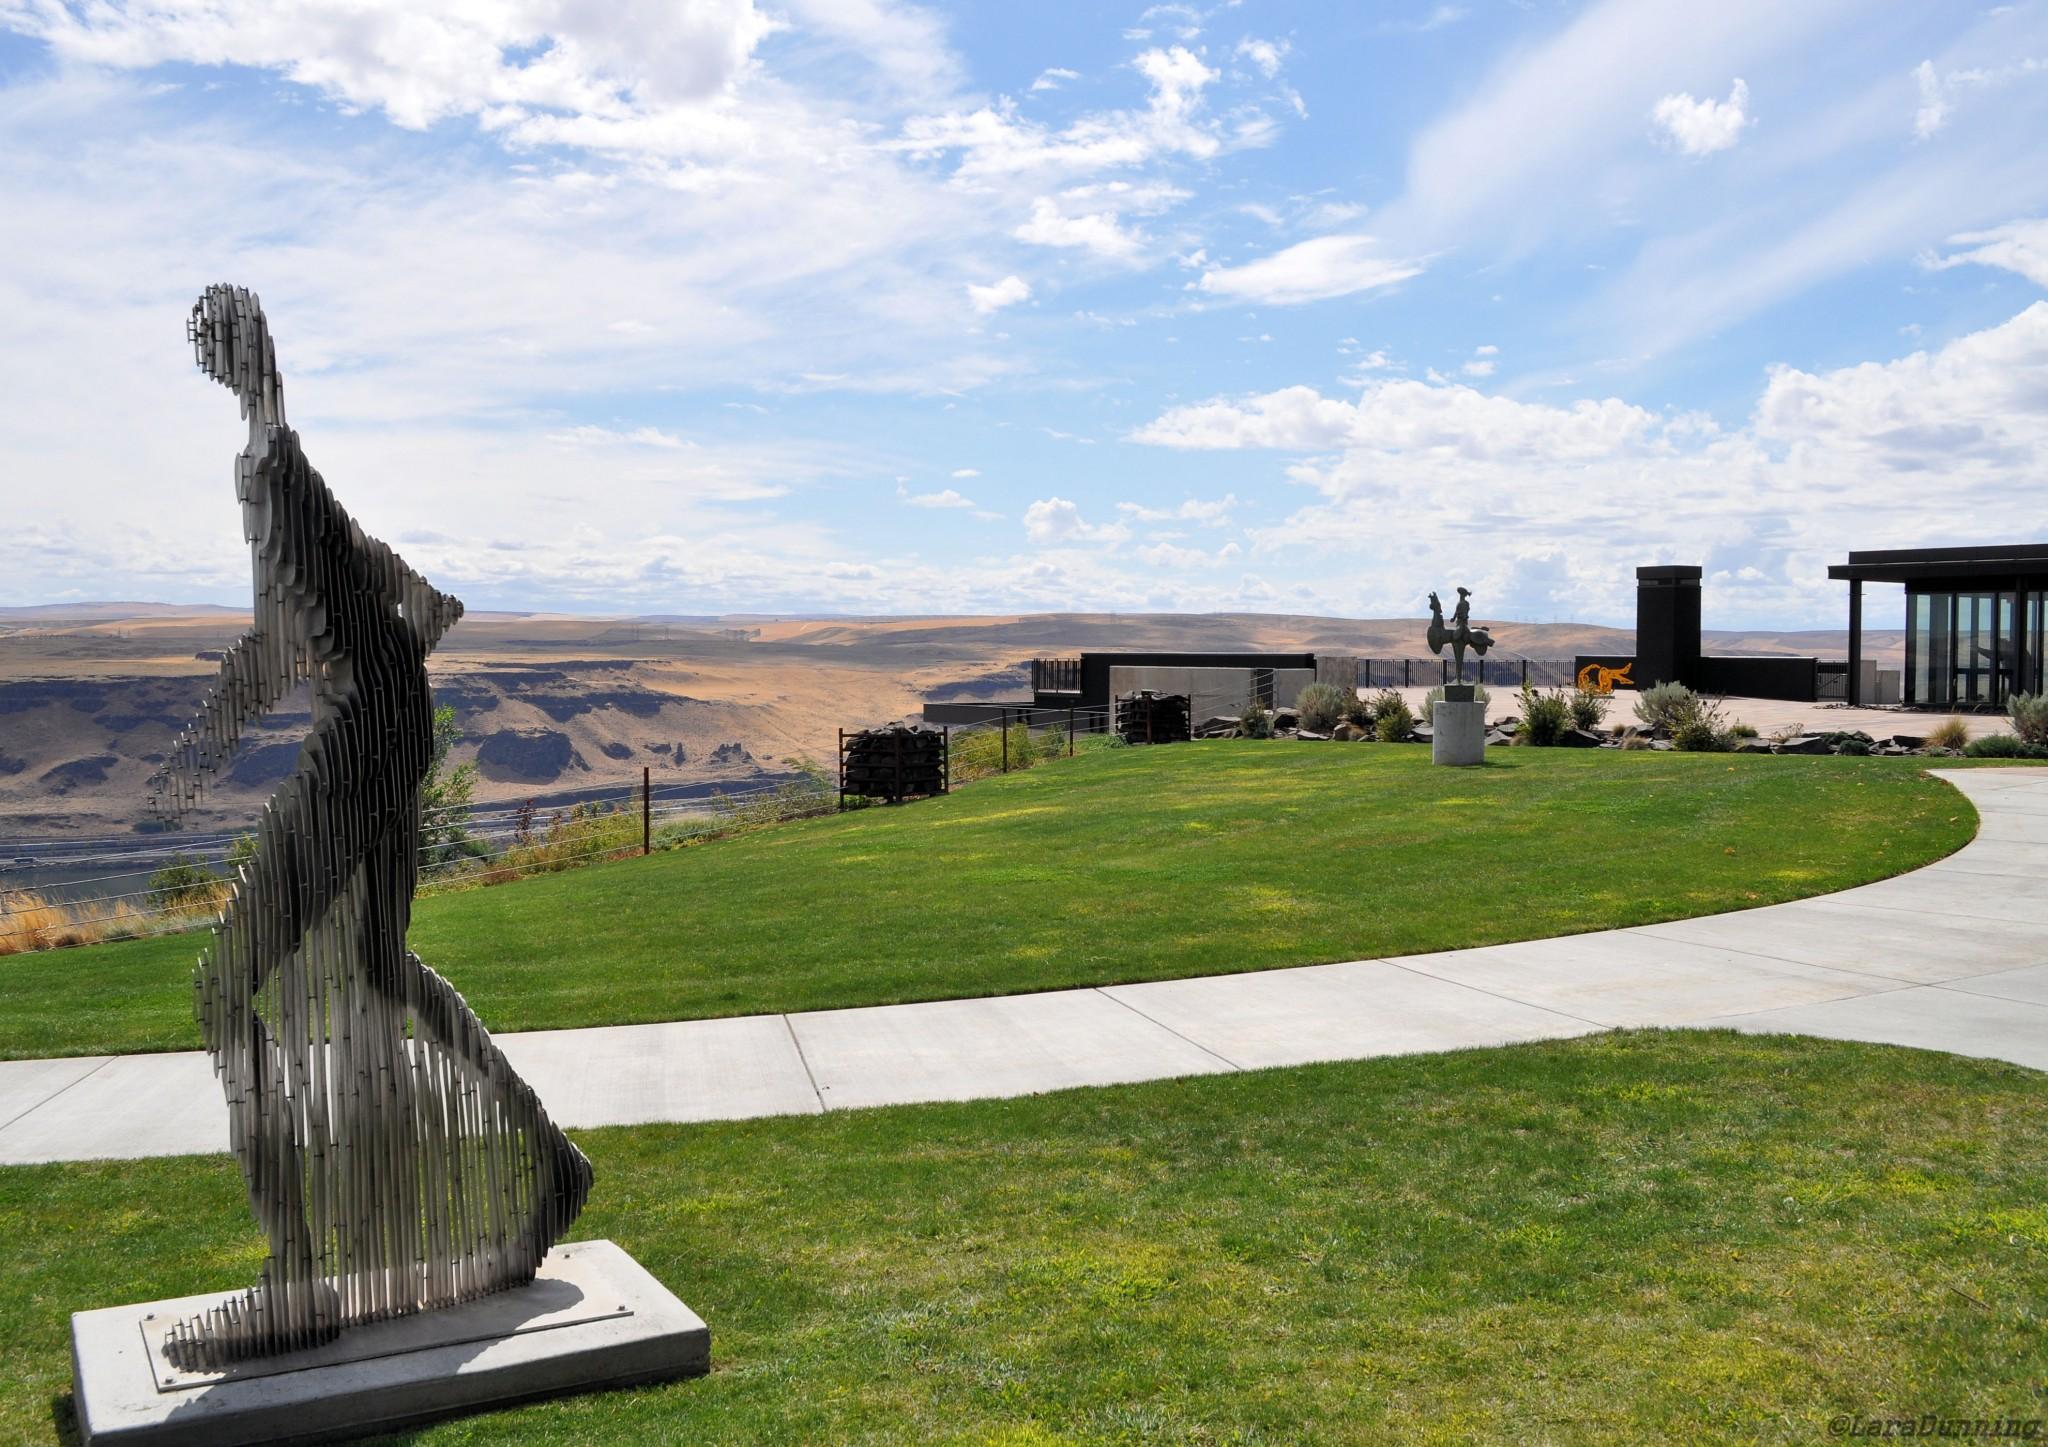 Top 6 Reasons to Stop In Maryhill, Washington - Art